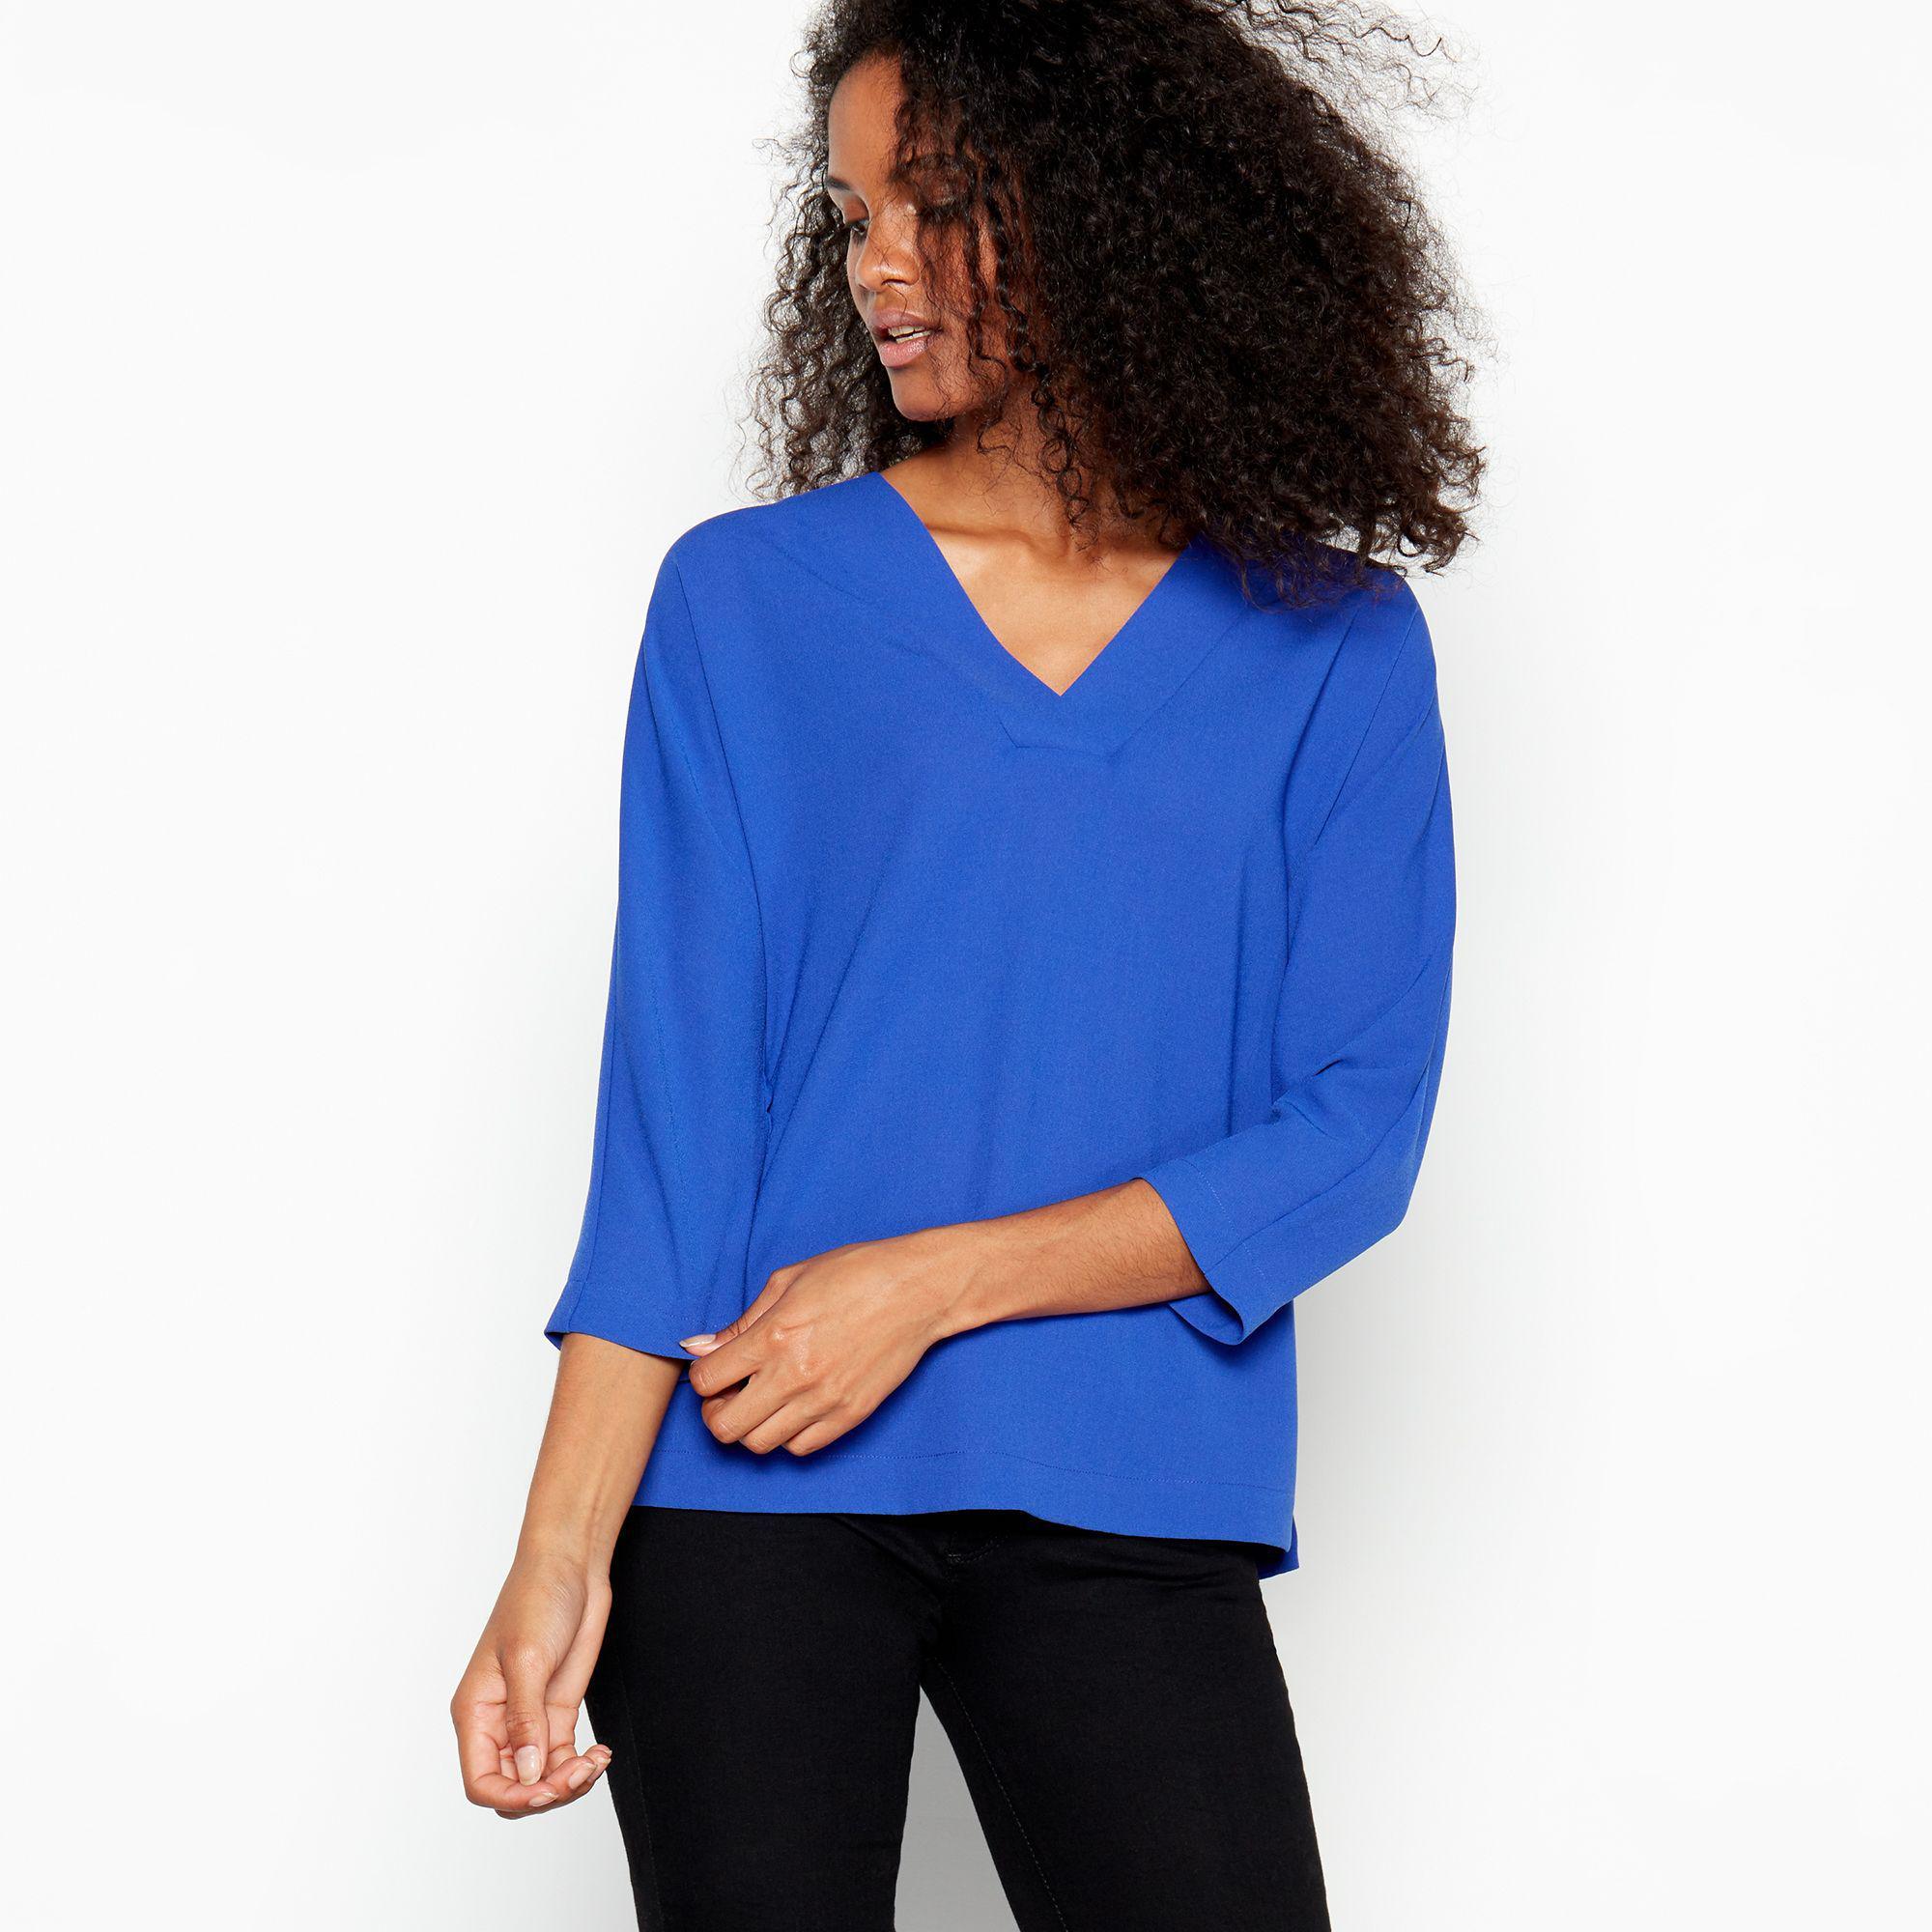 b267ba288125d J By Jasper Conran Blue V-neck Top in Blue - Lyst